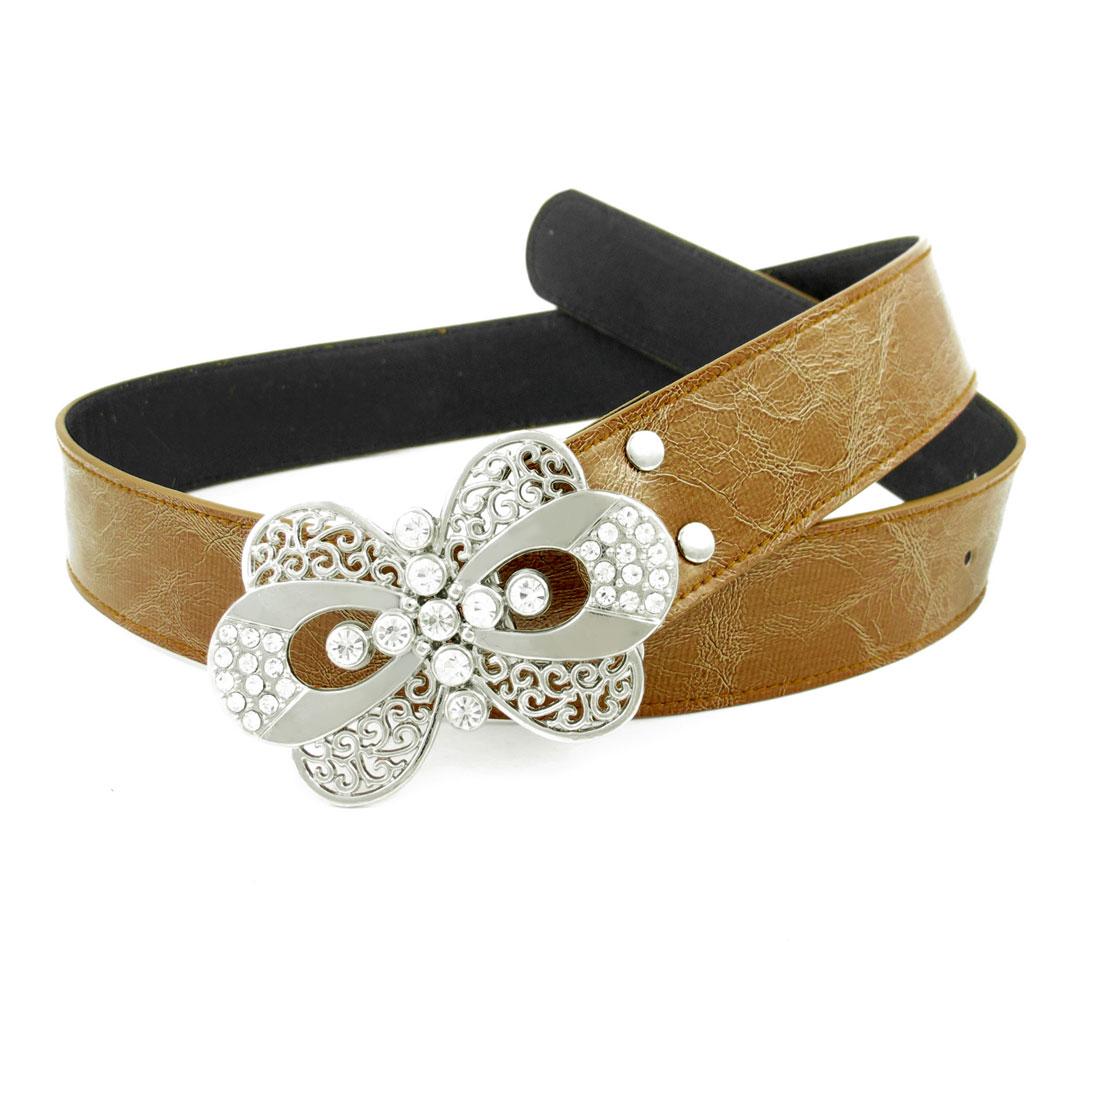 Metal Butterfly Interlocking Buckle Waist Cinch Belt Brown for Ladies